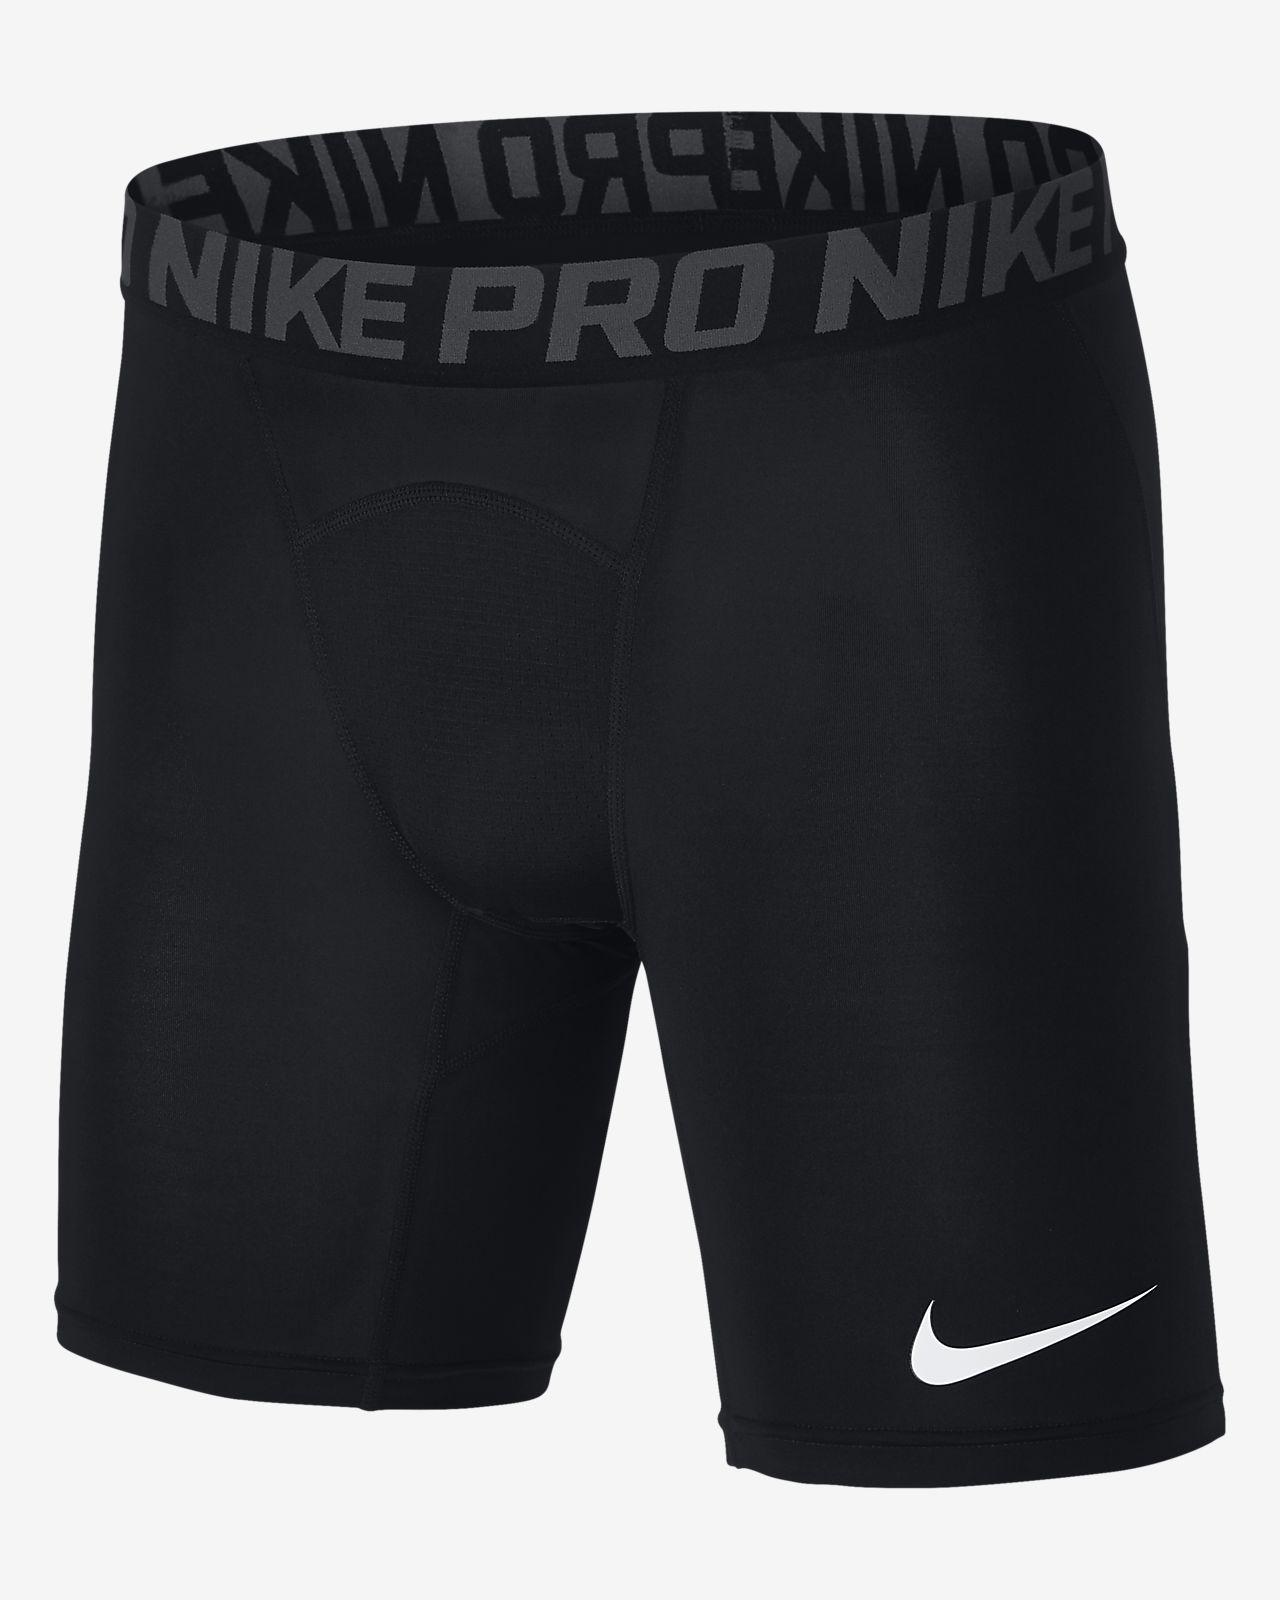 Nike Pro 15 cm Erkek Antrenman Şortu